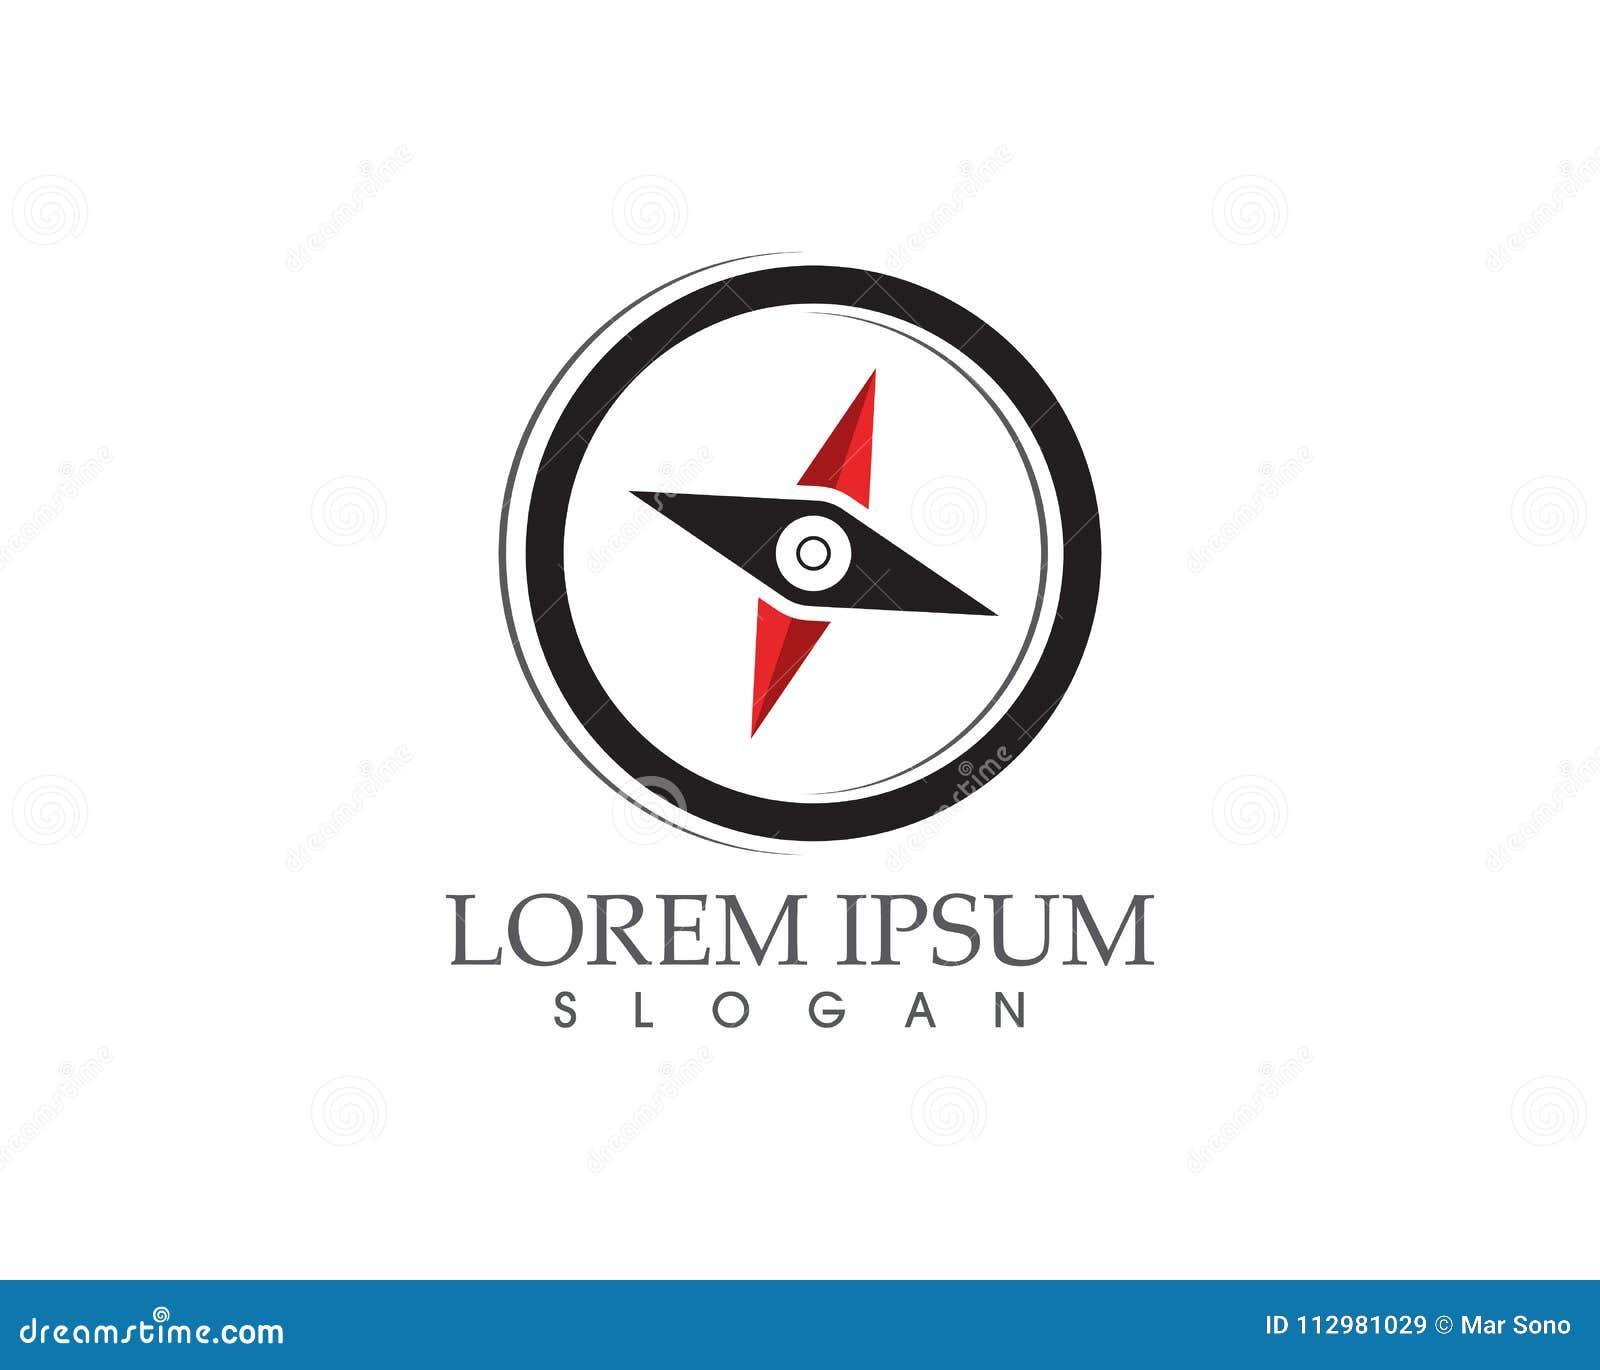 Compass logo and symbols signs and symbols logo